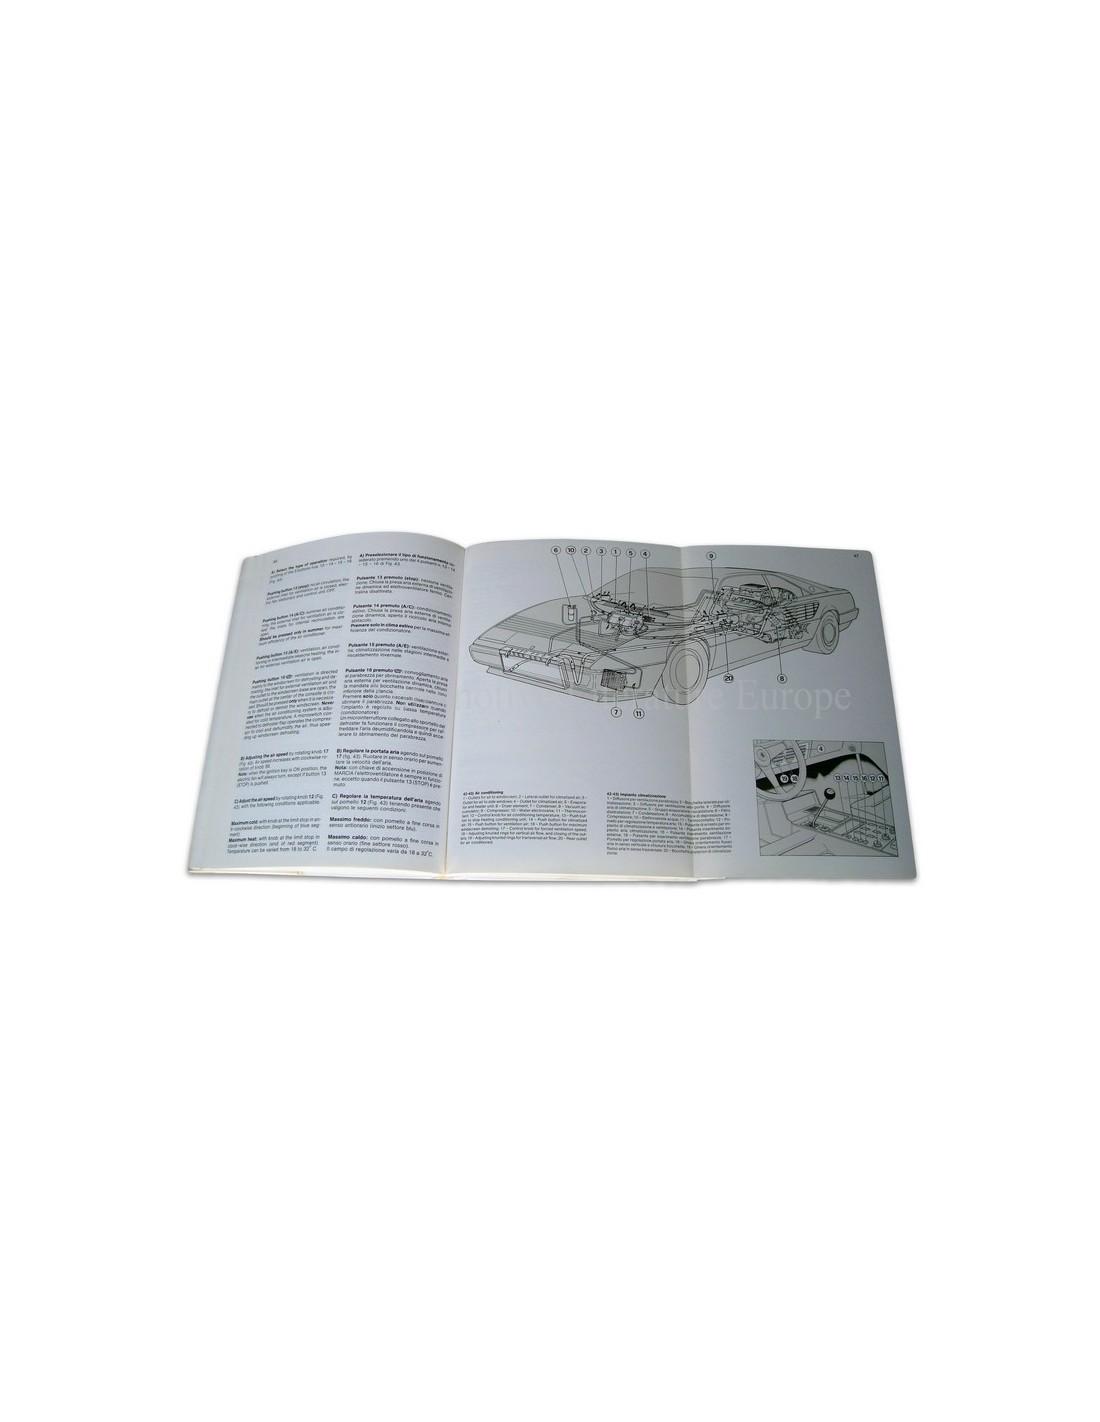 1988 ferrari 3 2 mondial owner 39 s manual u s version 481 87. Black Bedroom Furniture Sets. Home Design Ideas